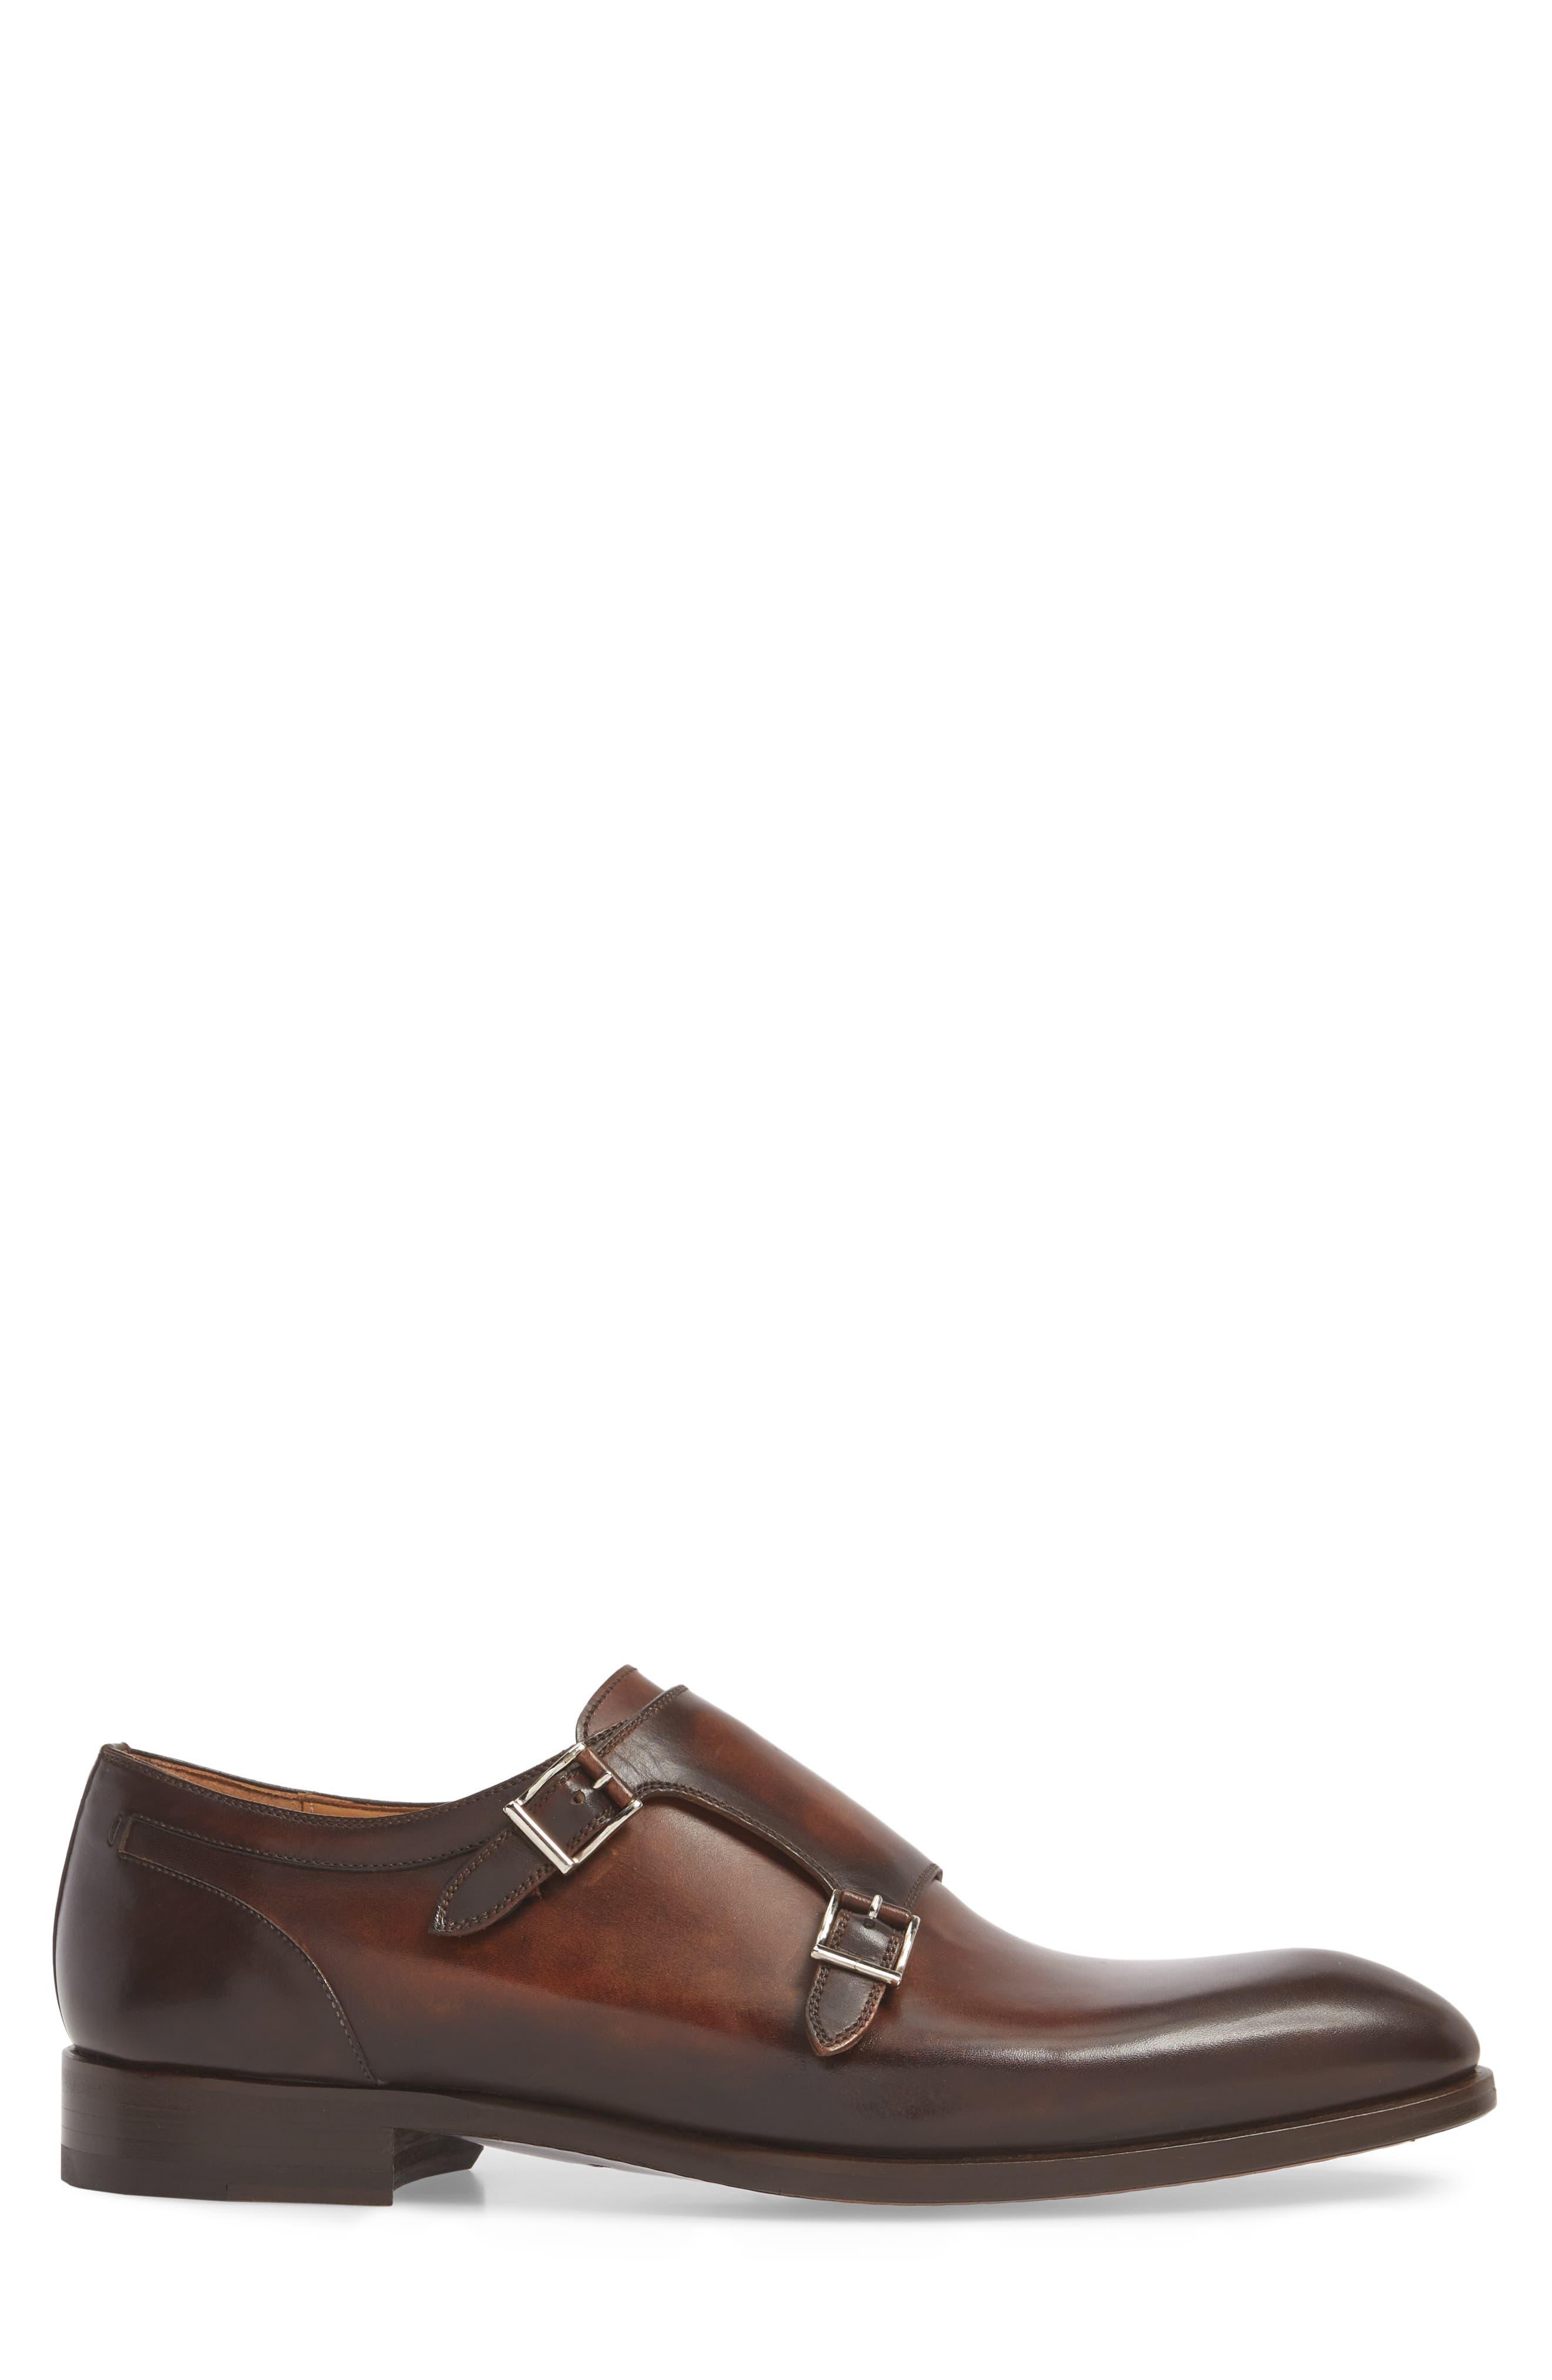 Pratt Double Strap Monk Shoe,                             Alternate thumbnail 3, color,                             Tabaco Leather